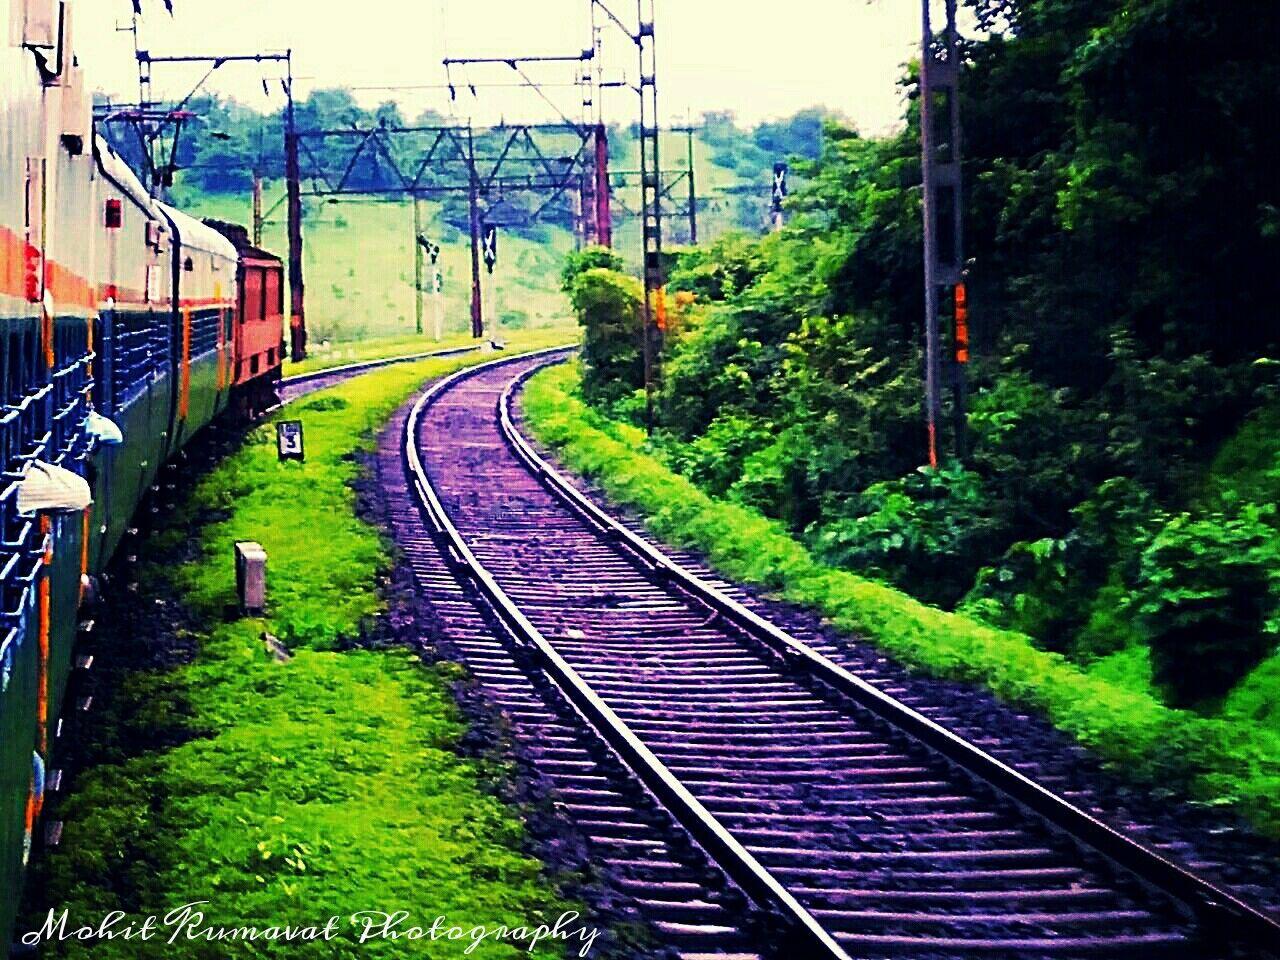 railroad track, transportation, rail transportation, day, public transportation, no people, plant, outdoors, tree, nature, sky